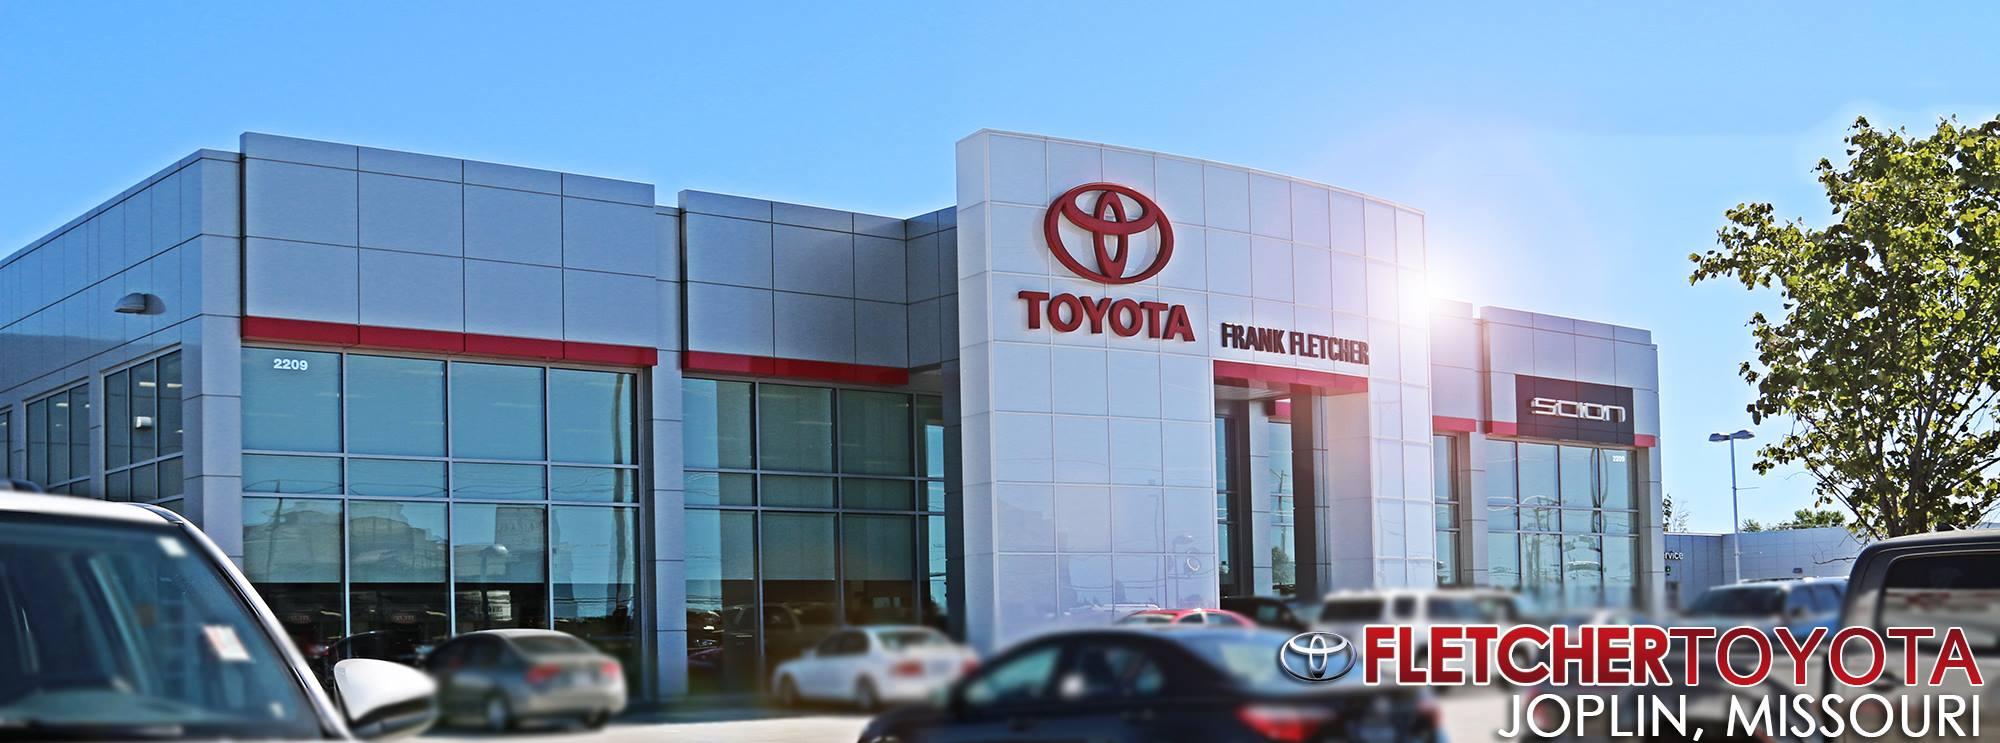 Fletcher Toyota Joplin Mo >> New Vehicle Specials Frank Fletcher Toyota